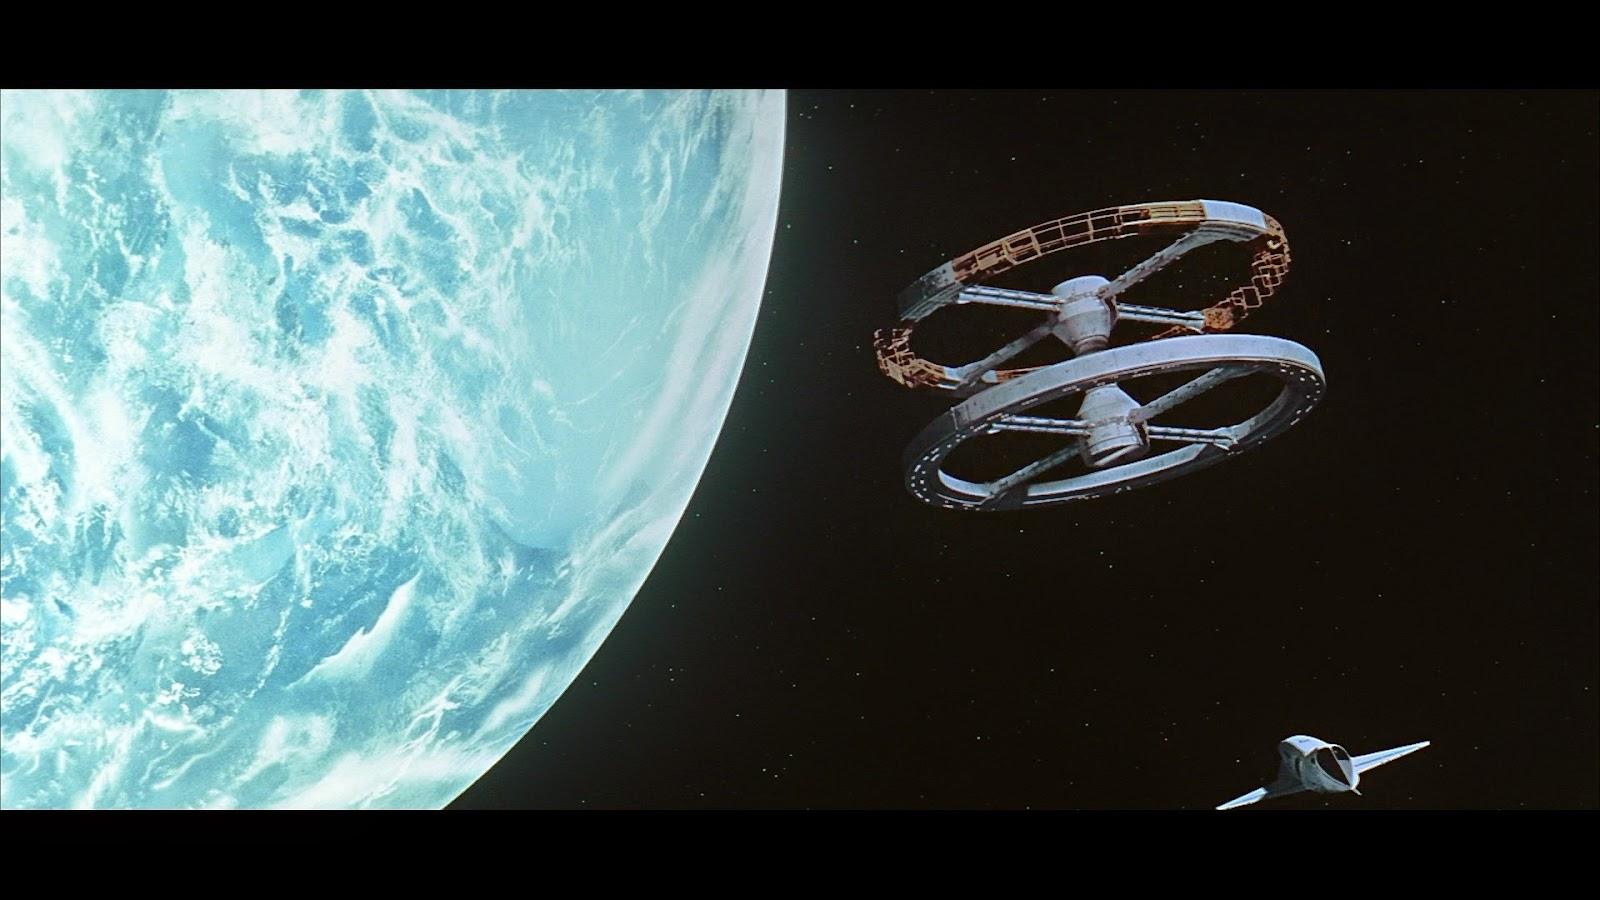 Spaceplane / Interplanetary transportation / New Mars Forums